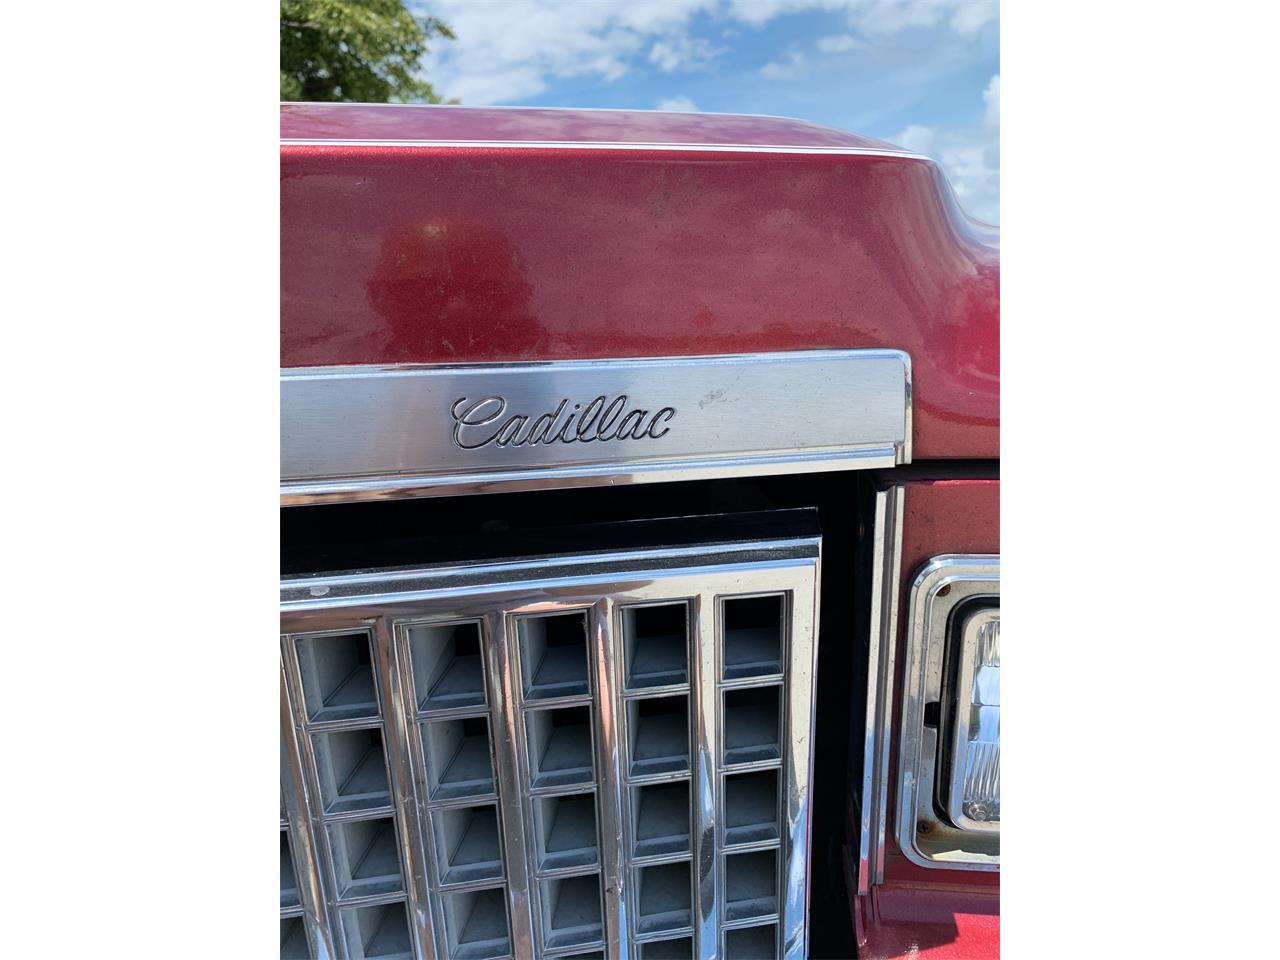 1975 Cadillac Eldorado (CC-1368195) for sale in Plainfield, Illinois